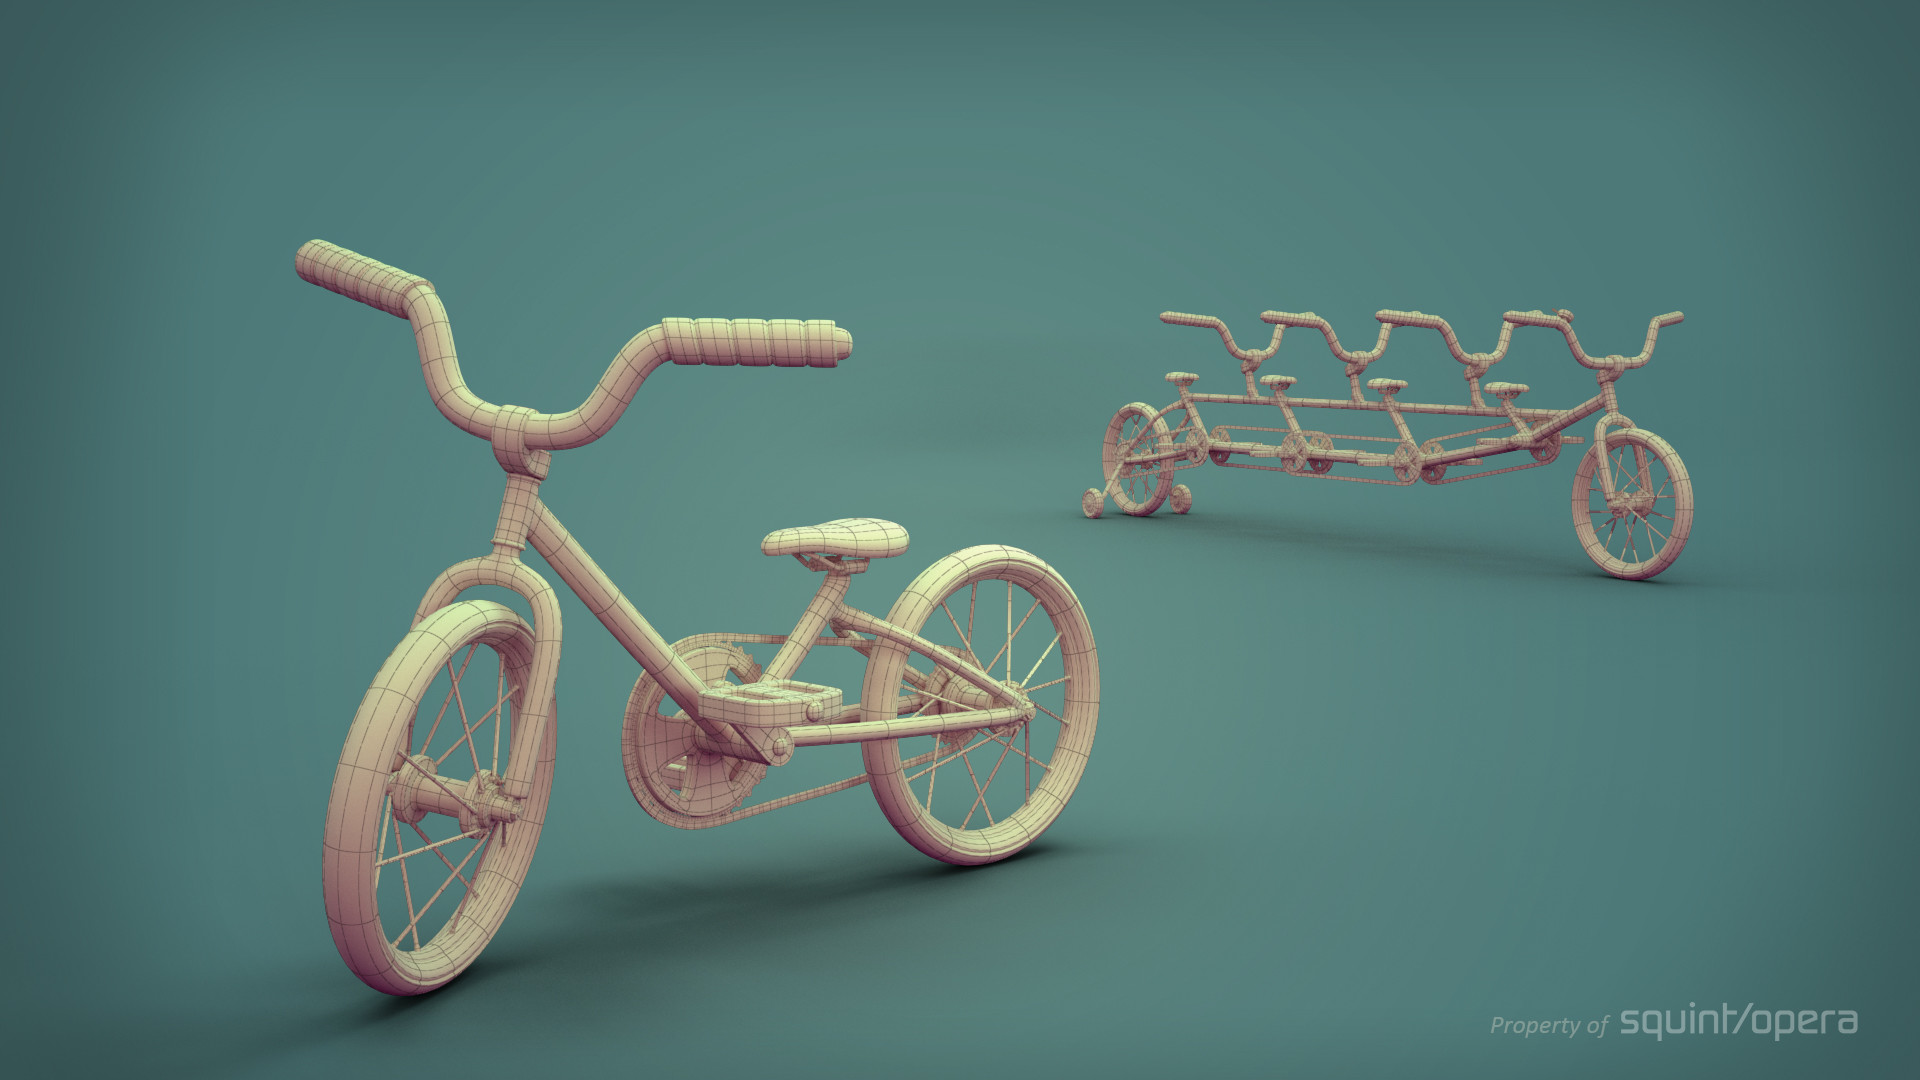 Erika eguia bicyclewire